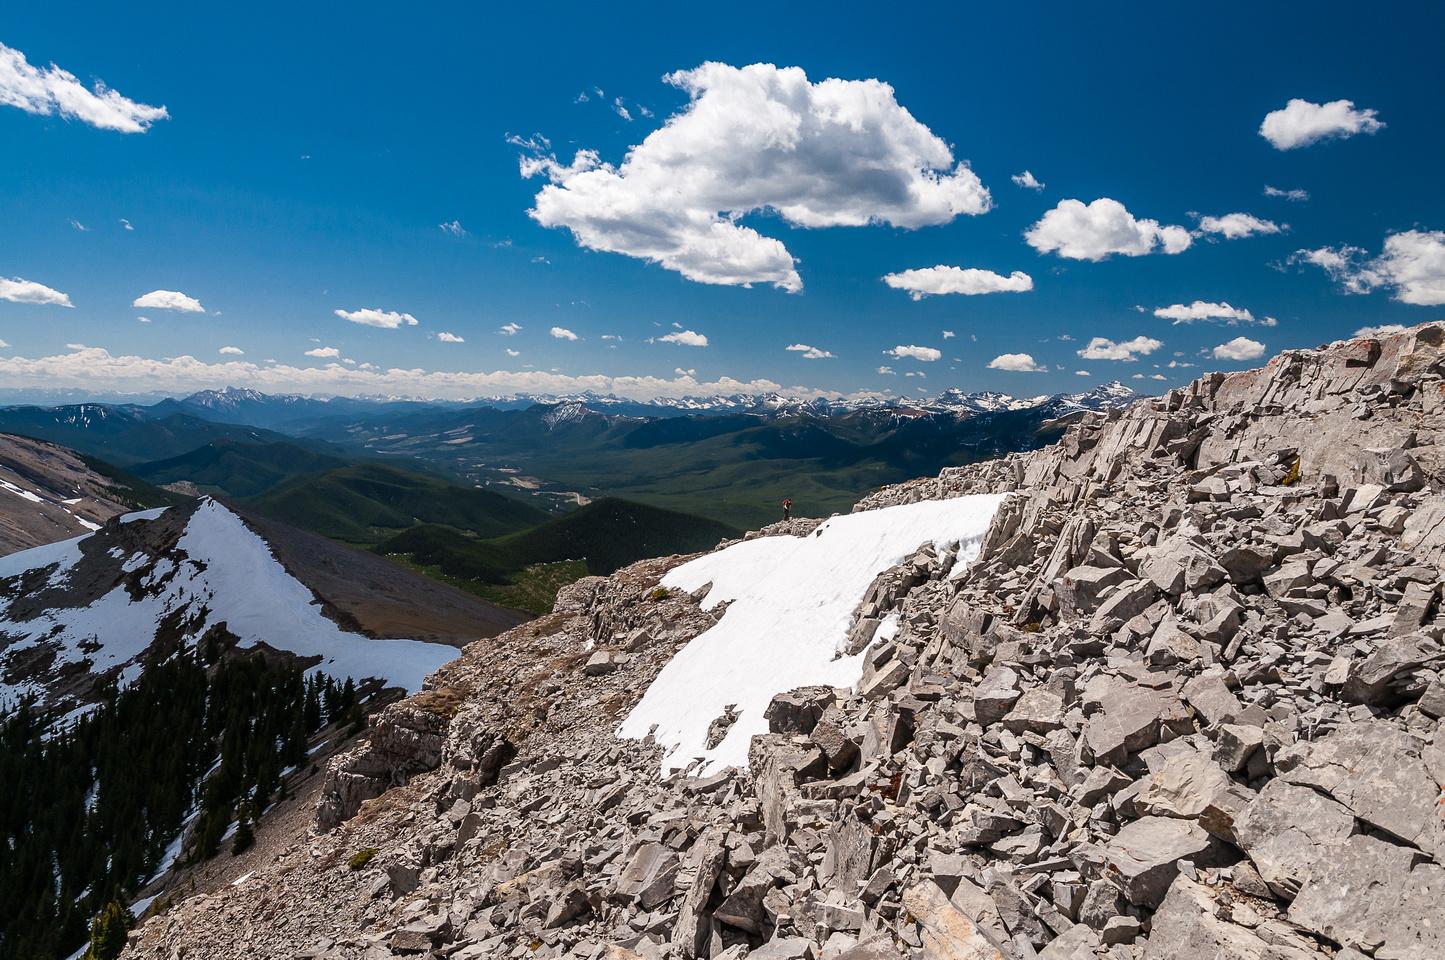 Wietse approaches the summit of Mount Livingstone.